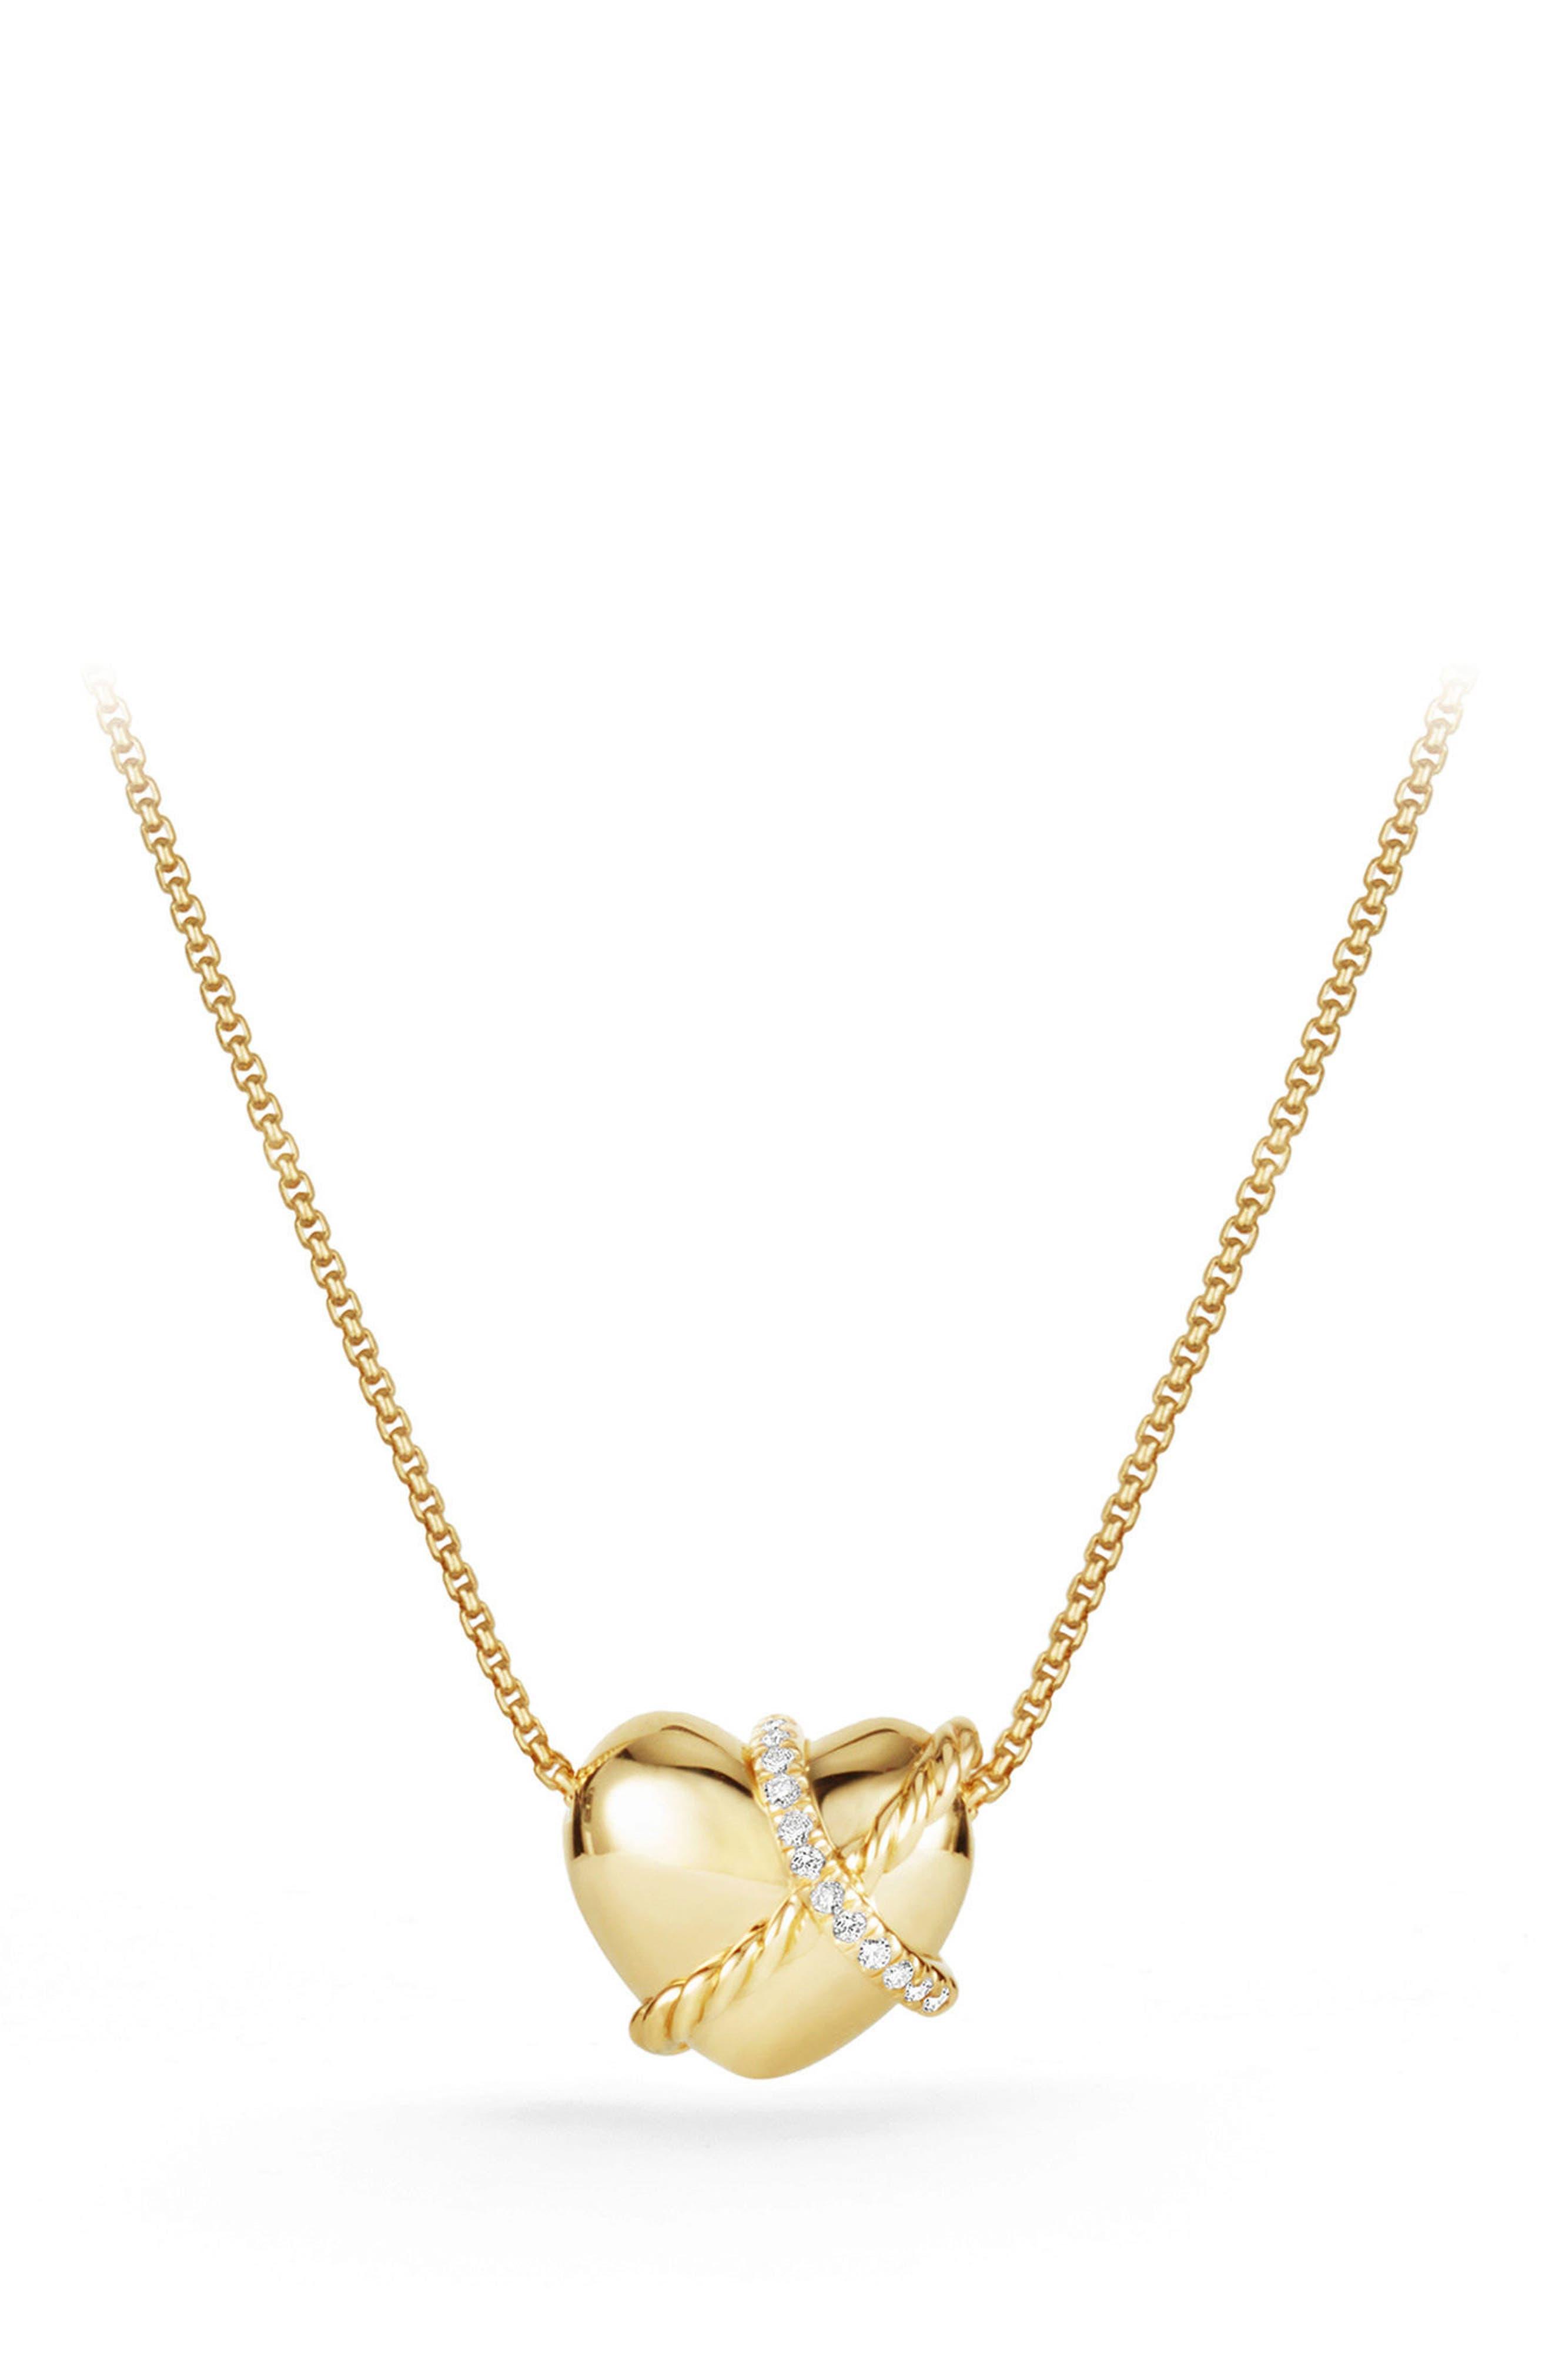 Main Image - David Yurman Heart Pendant Necklace in 18K Gold with Diamonds